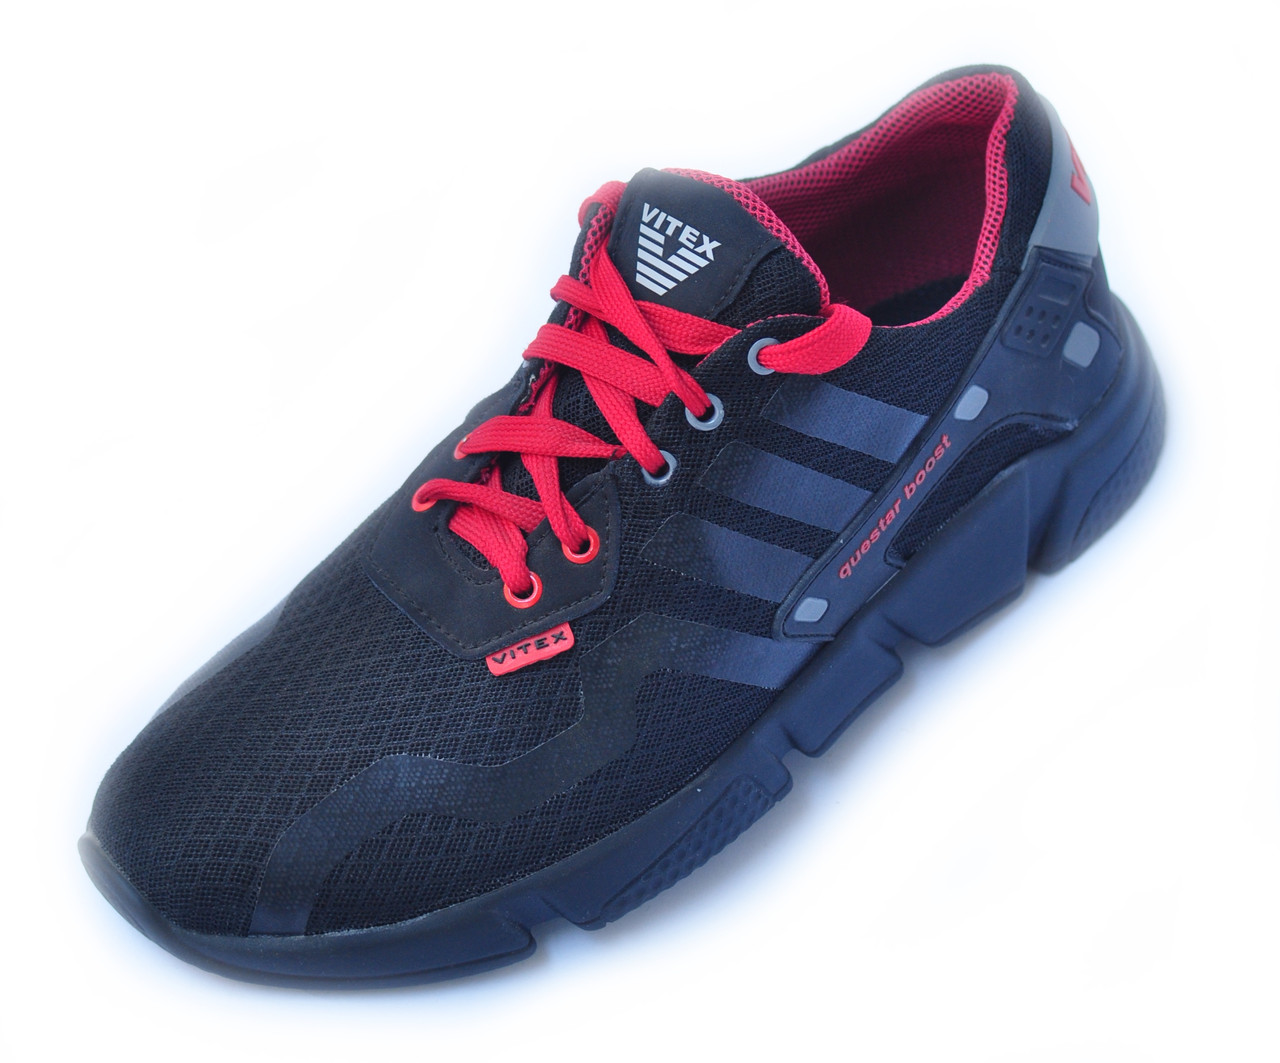 Мужские кроссовки Vitex 10204